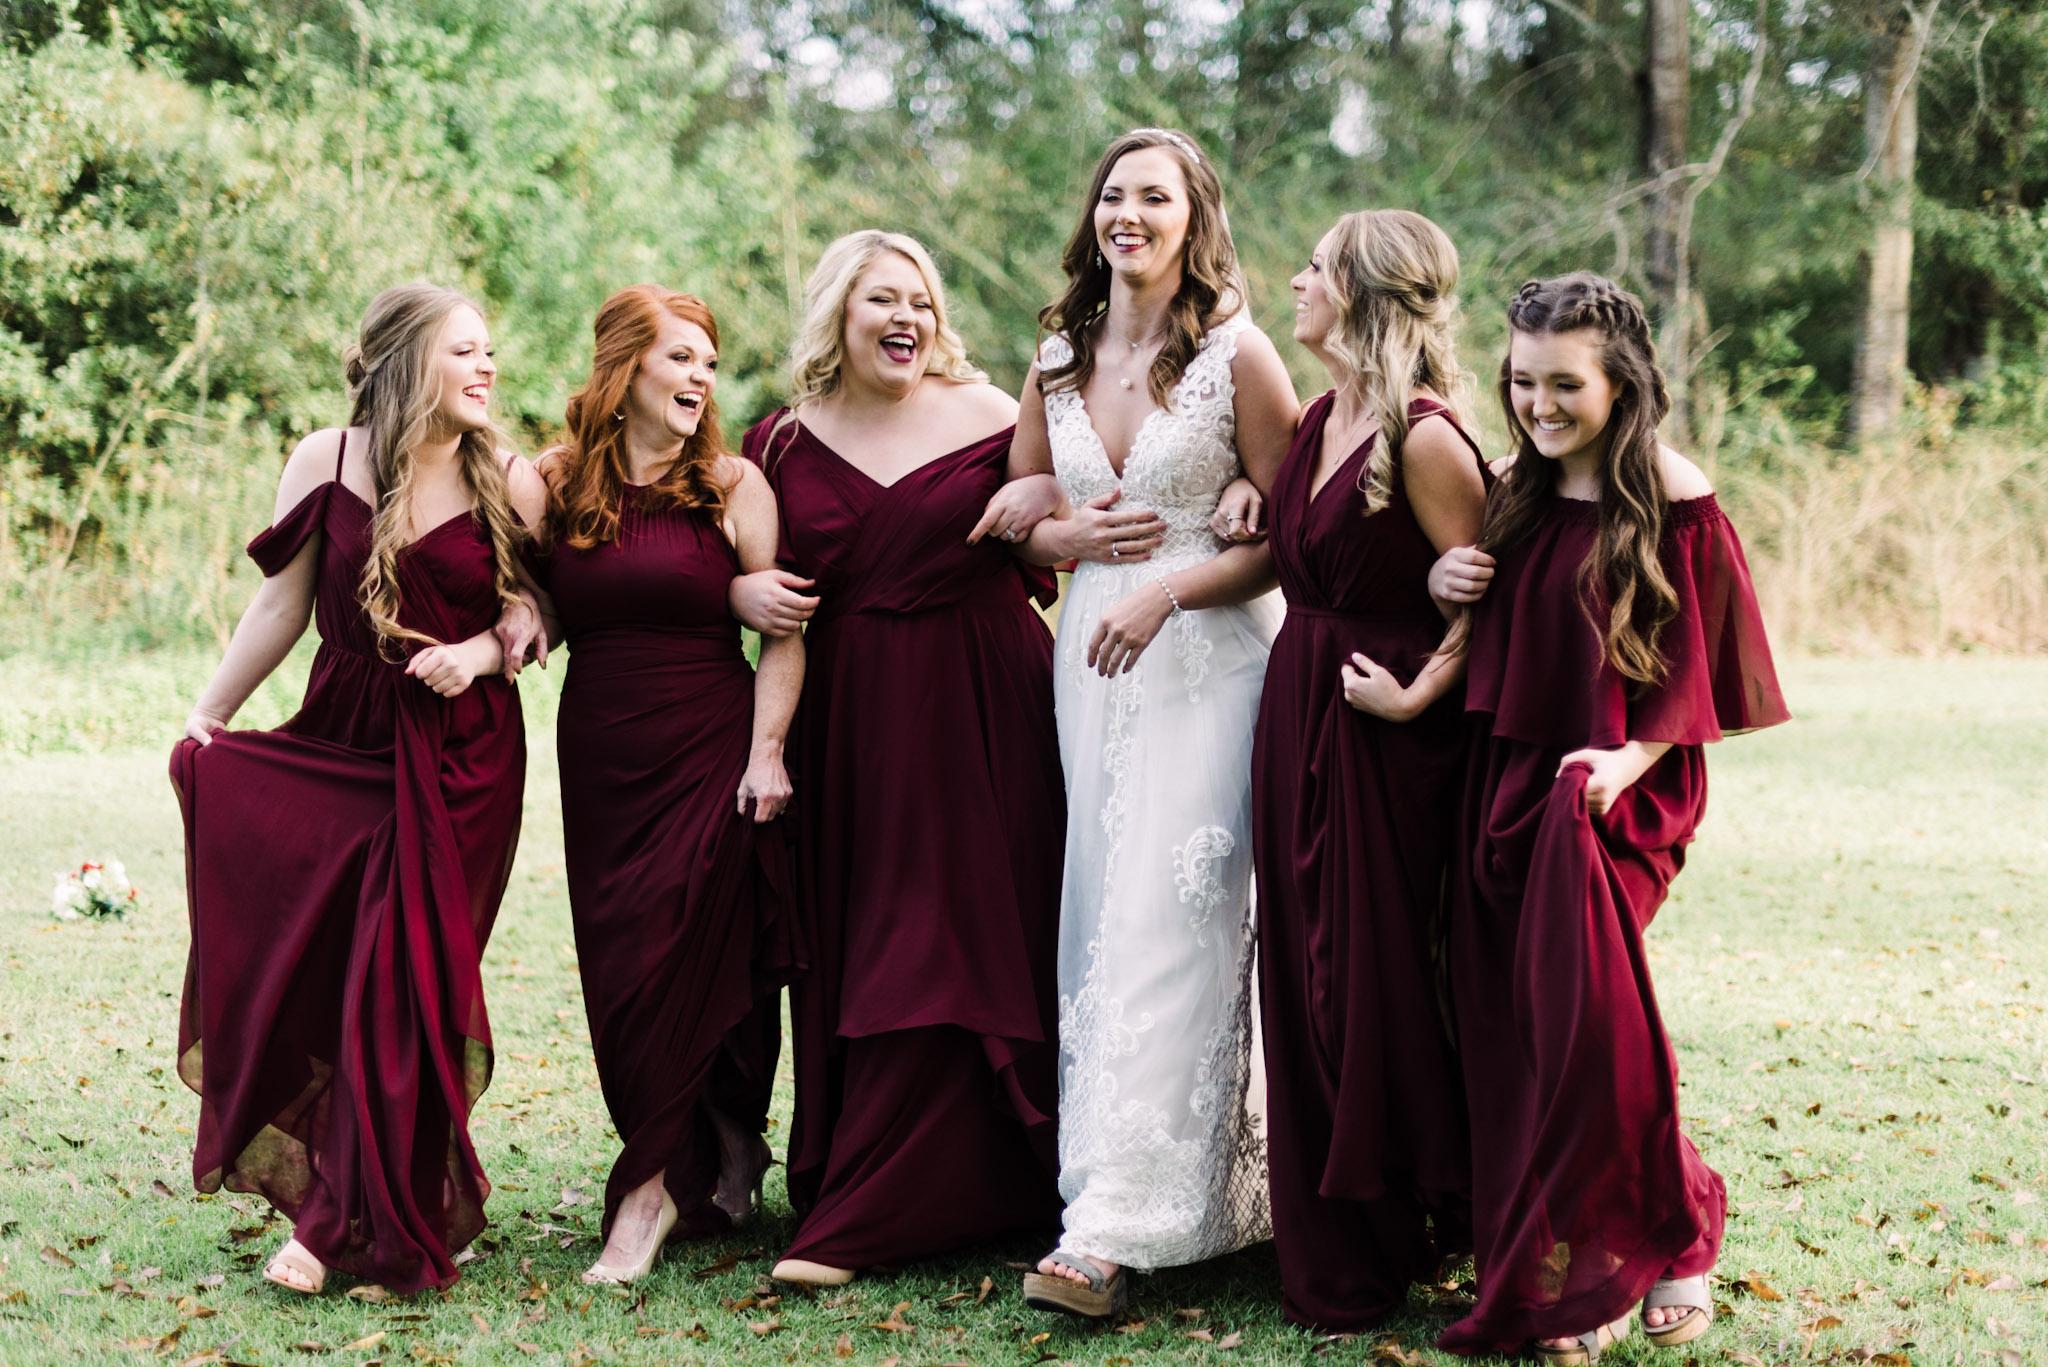 Jas_Natalie_Foxworth_Wedding_2018-4.jpg